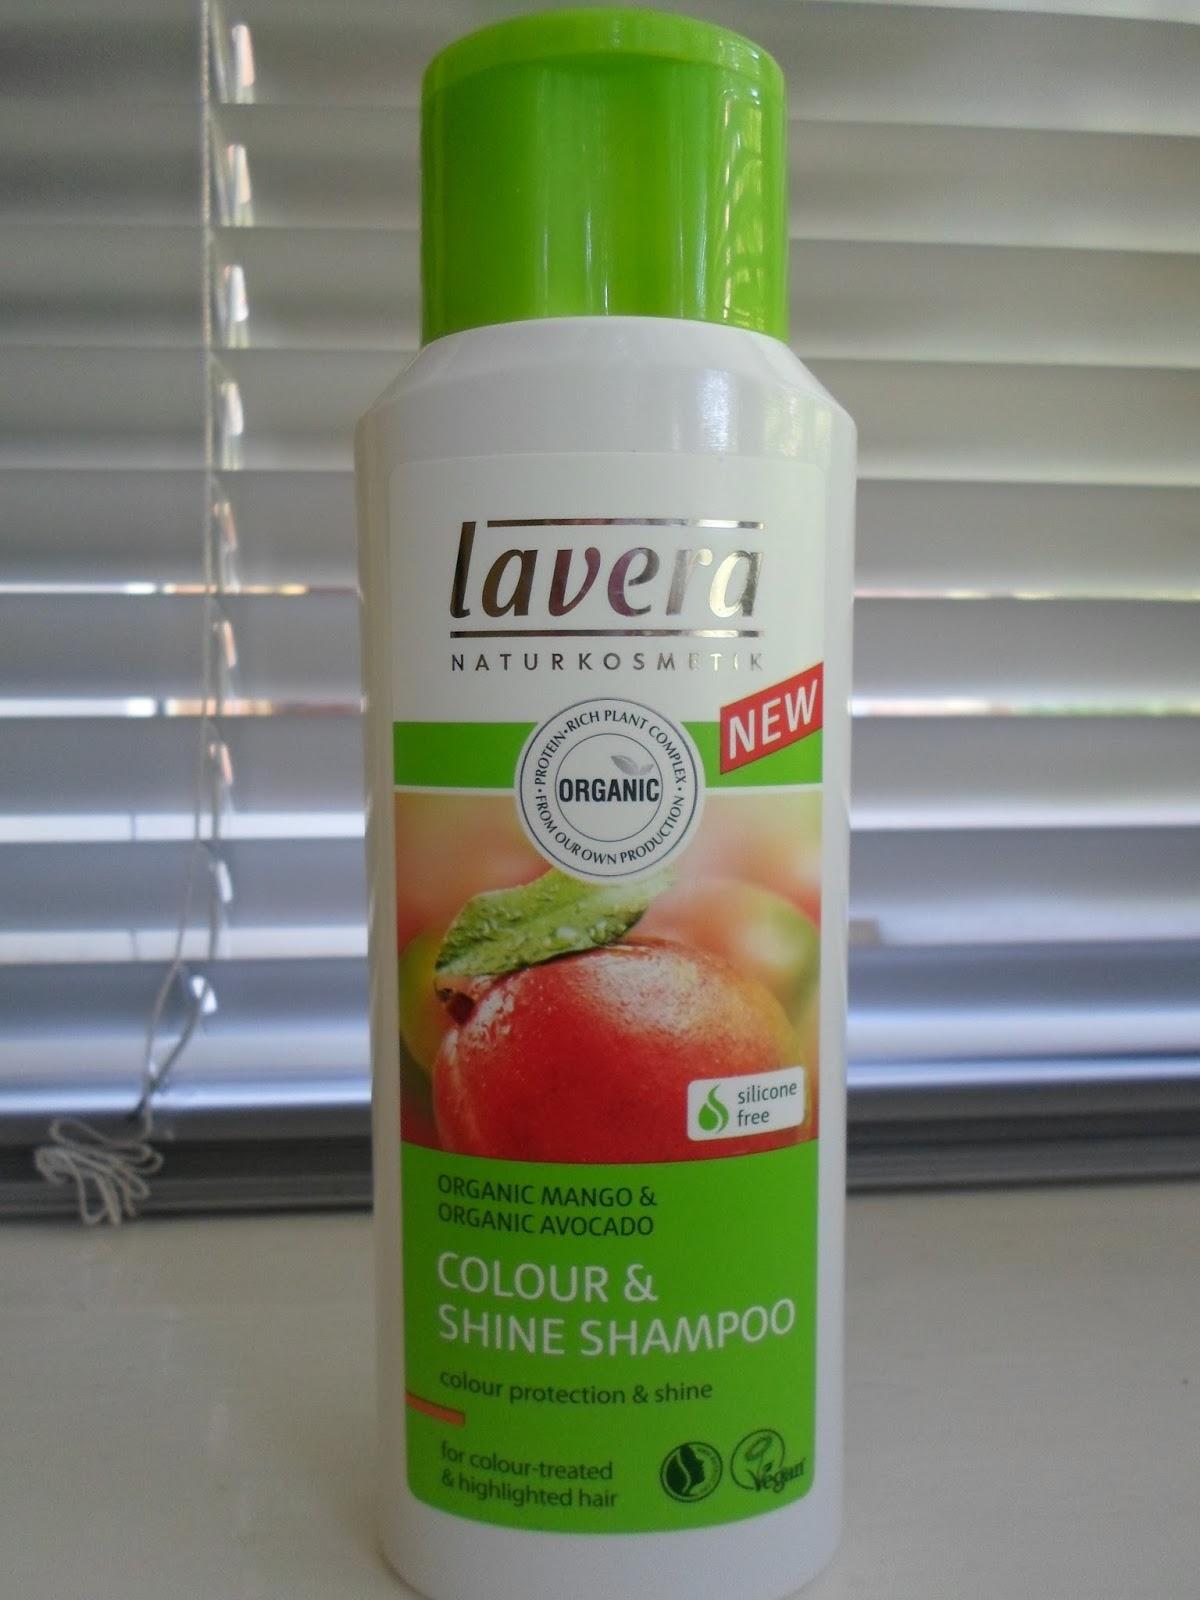 Lavera Colour & Shine Shampoo